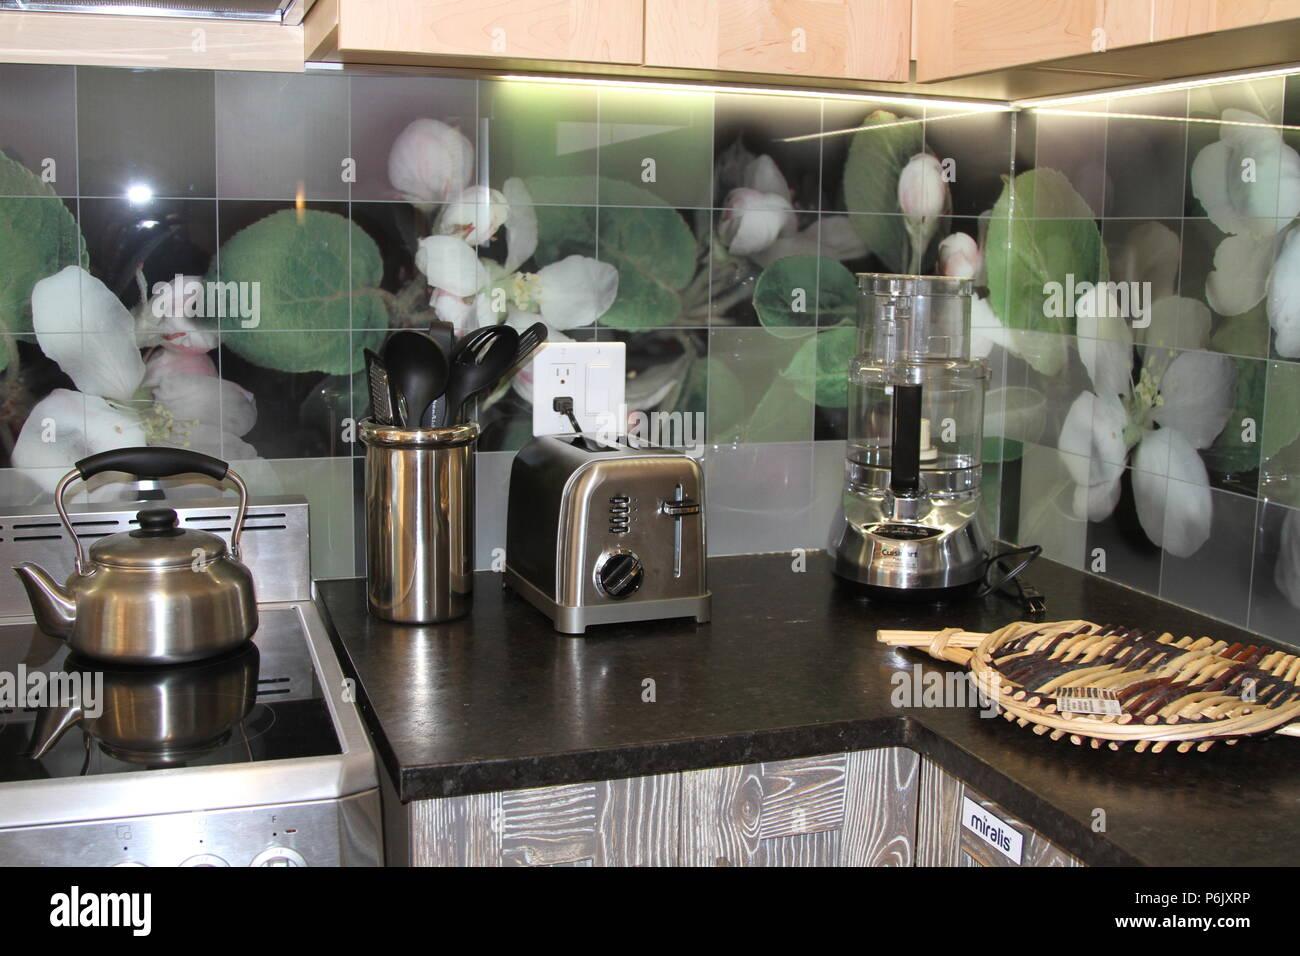 Modern Kitchen Counter With Floral Glass Backsplash Tiles